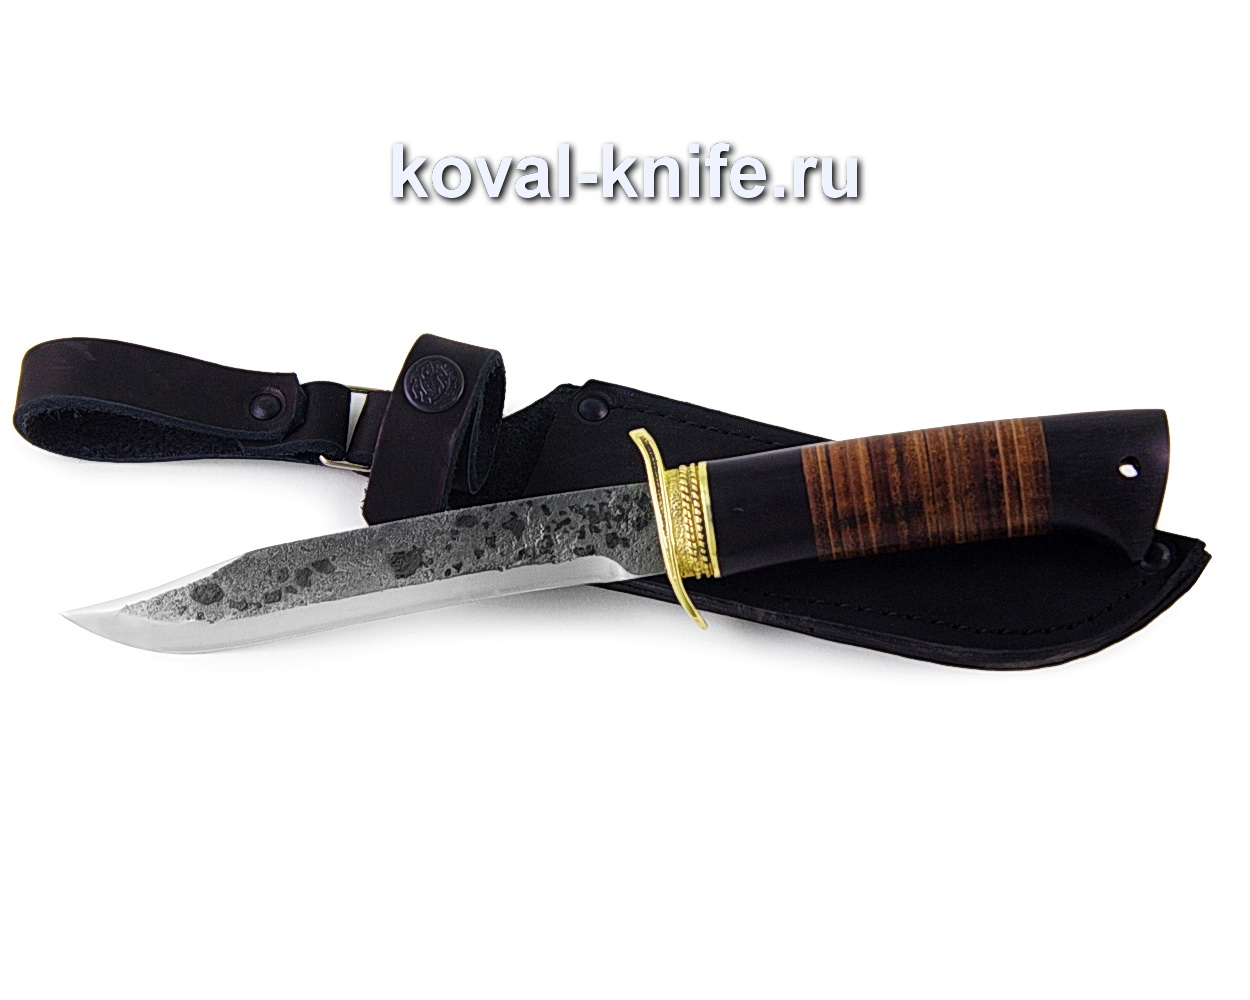 Нож Штрафбат из стали 9хс с рукоятью из кожи (Реплика Ножа НР-40) A374